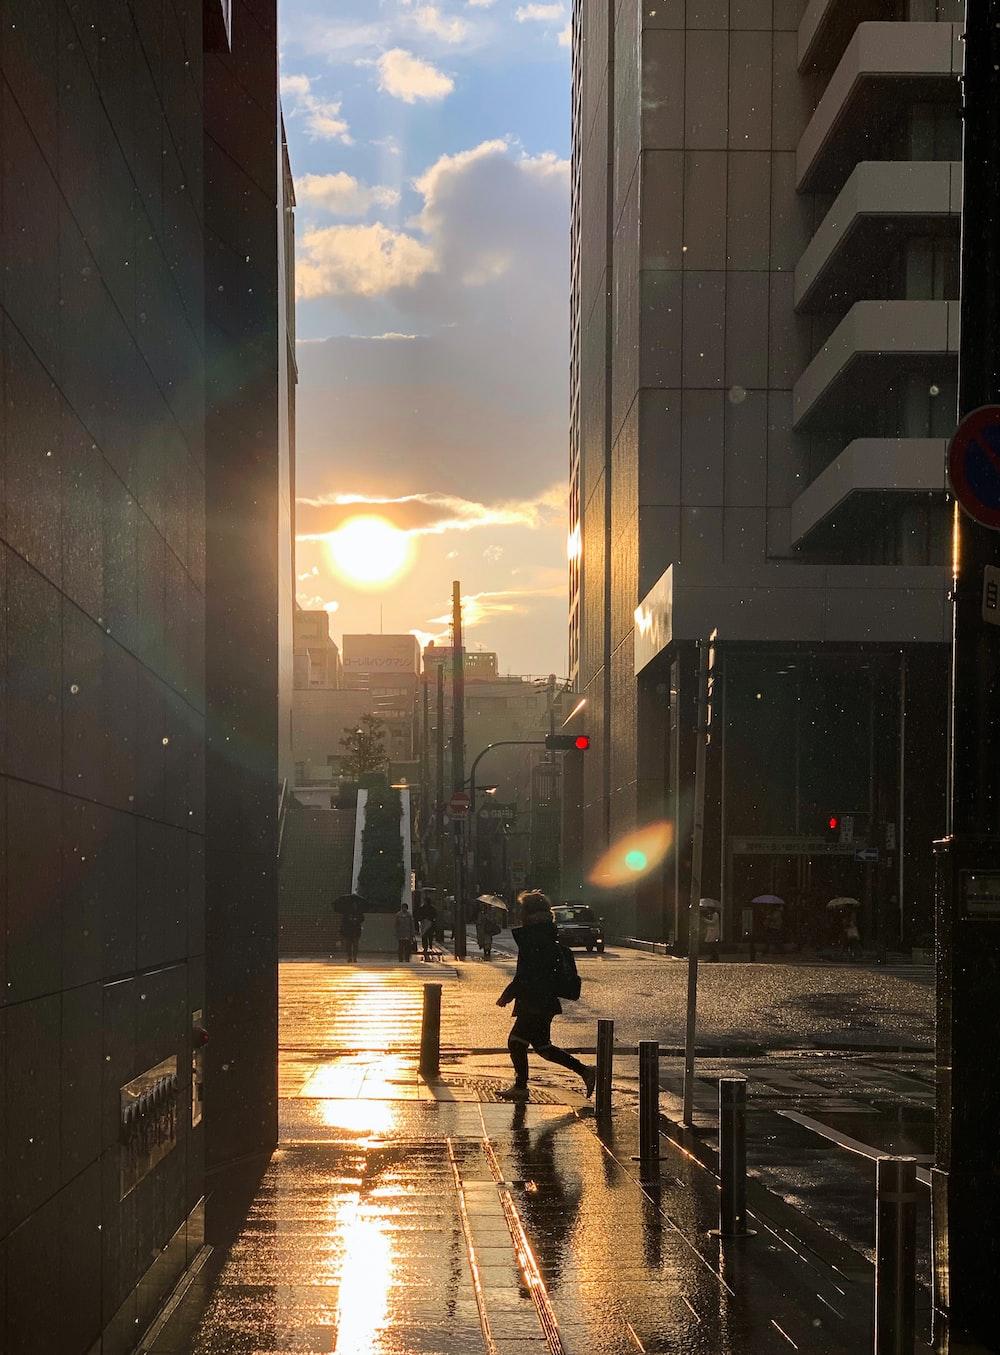 man walking near concrete buildings